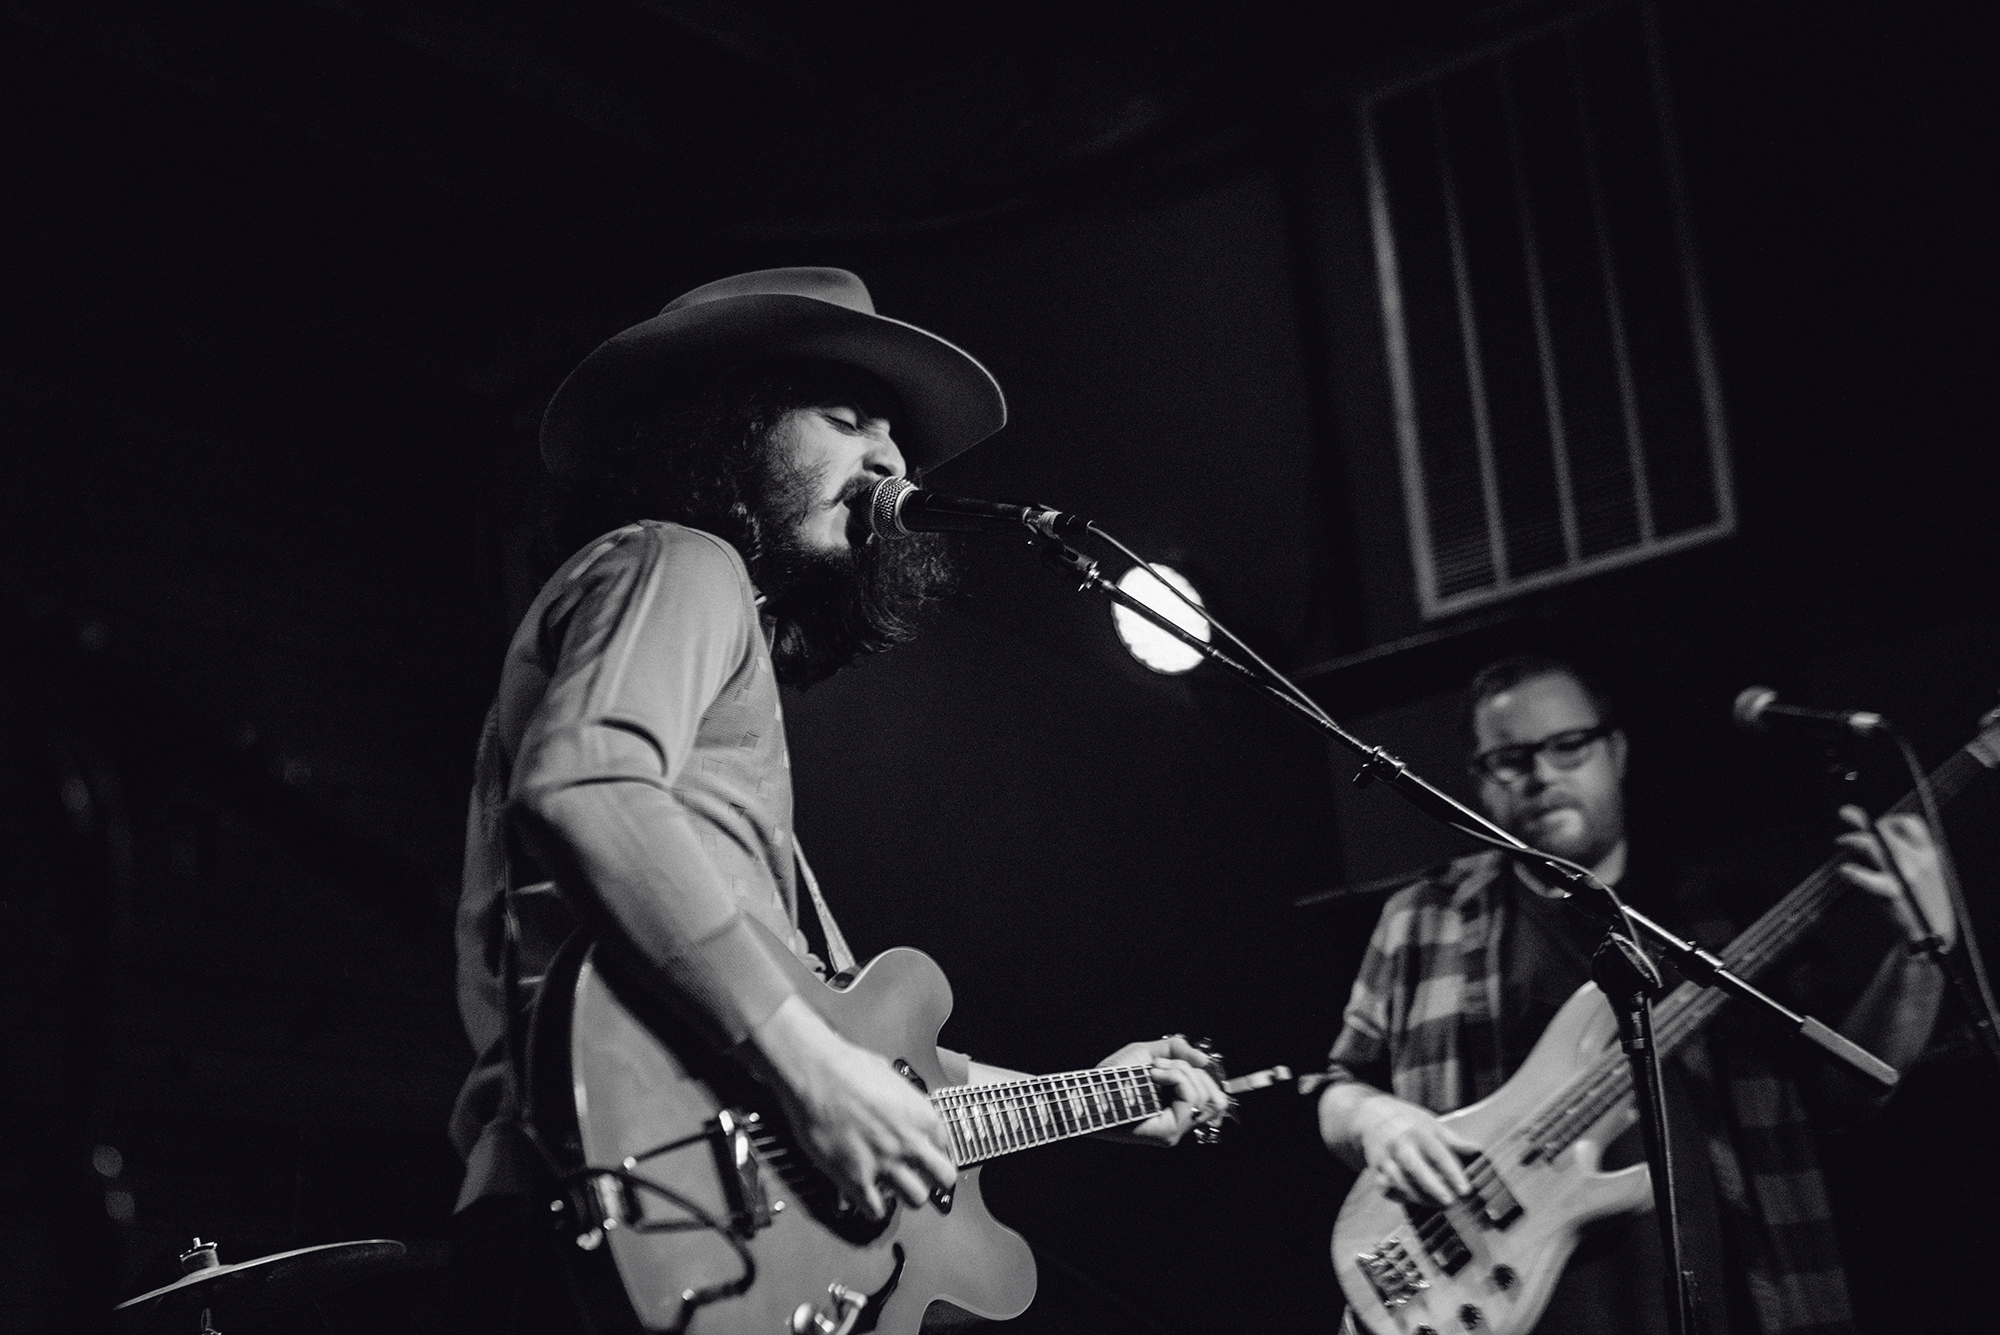 Austin-Concert-Photographer-5.jpg